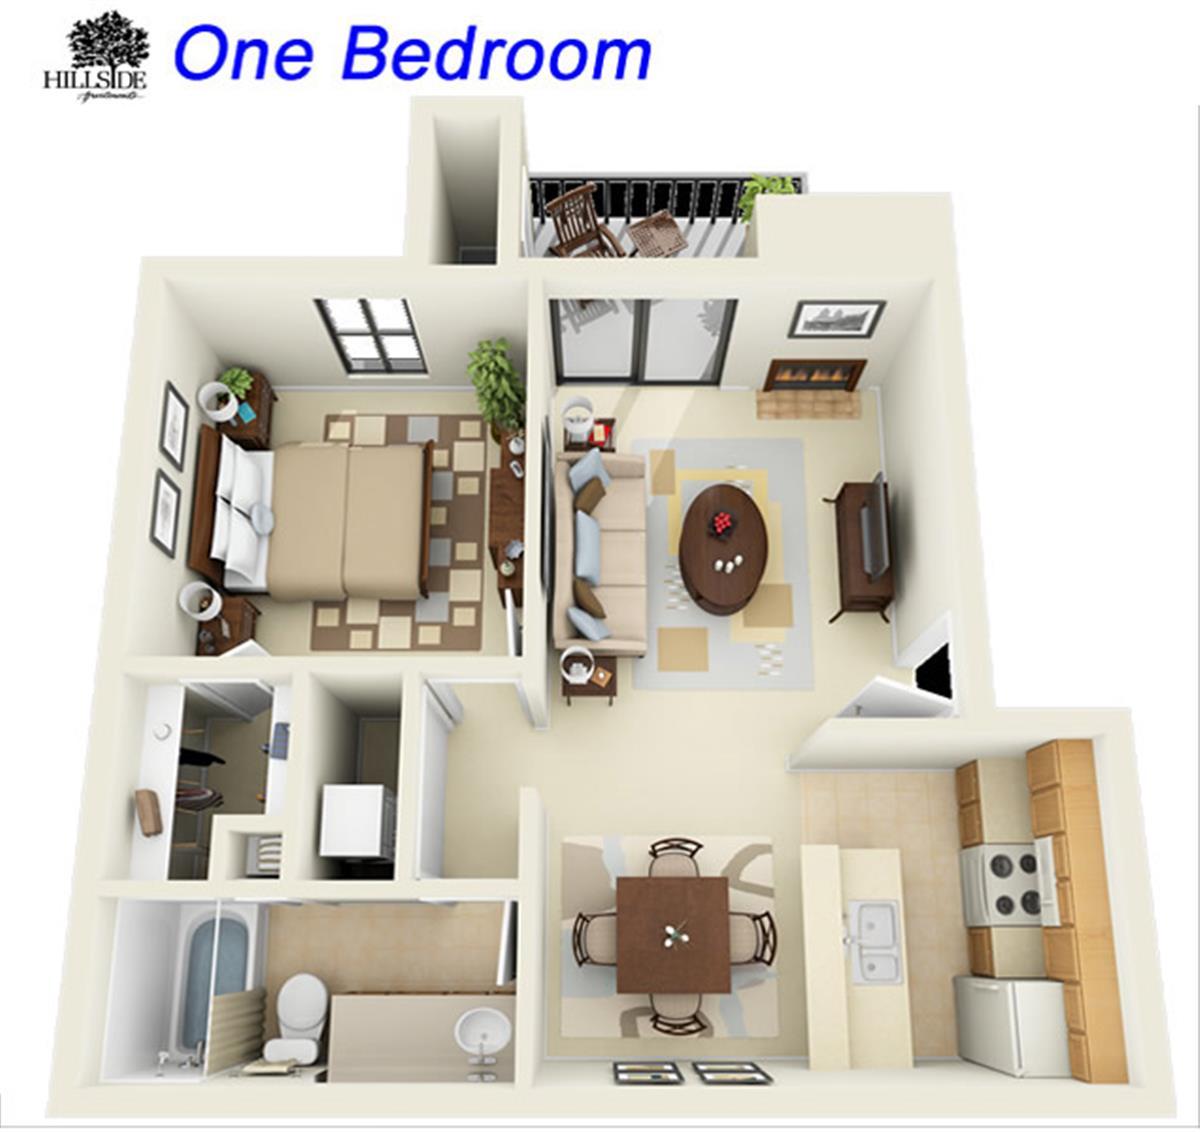 Studio Apartments For Rent In West Newyork Nj